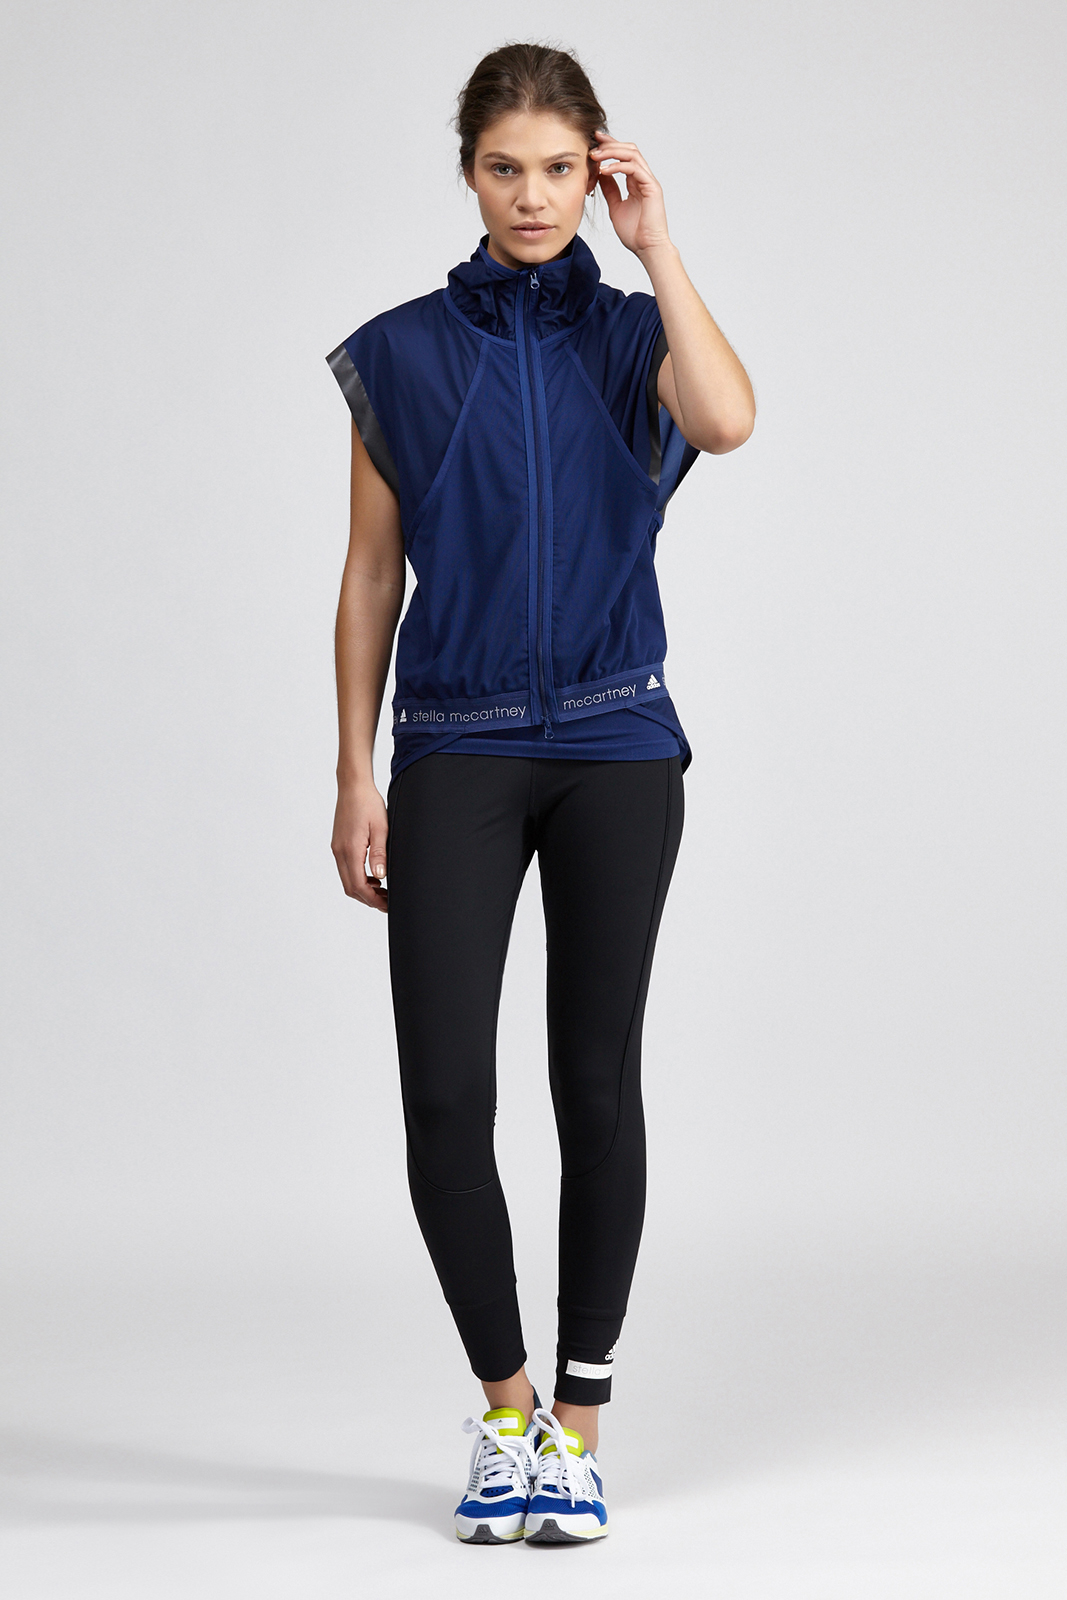 lyst adidas by stella mccartney adizero gilet in blue. Black Bedroom Furniture Sets. Home Design Ideas